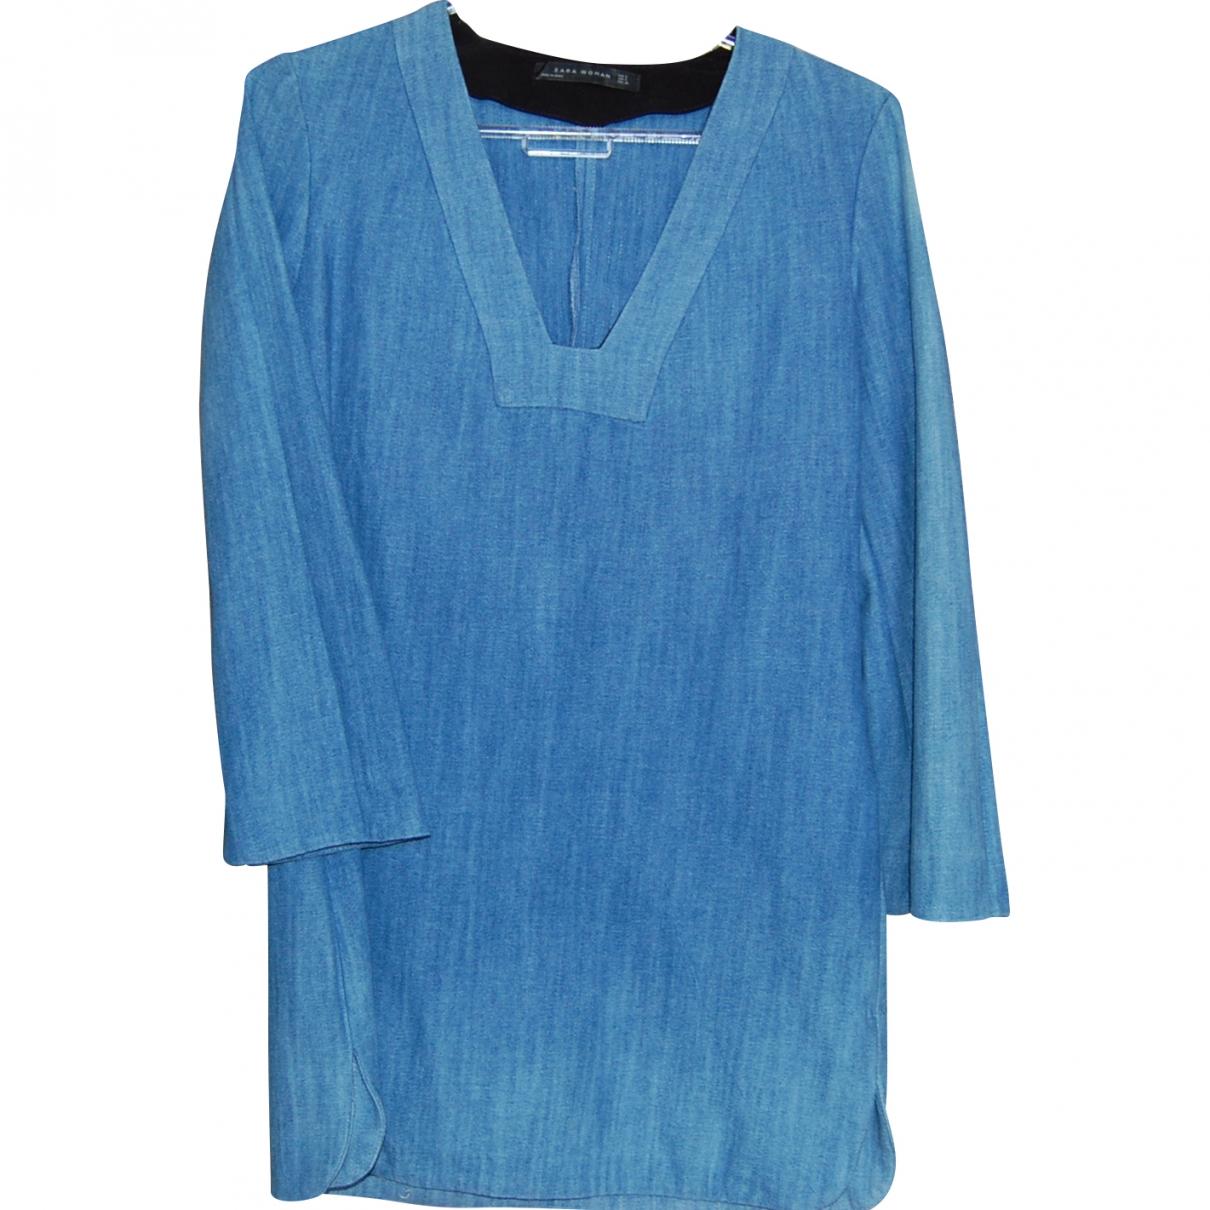 Zara \N Top in  Blau Denim - Jeans